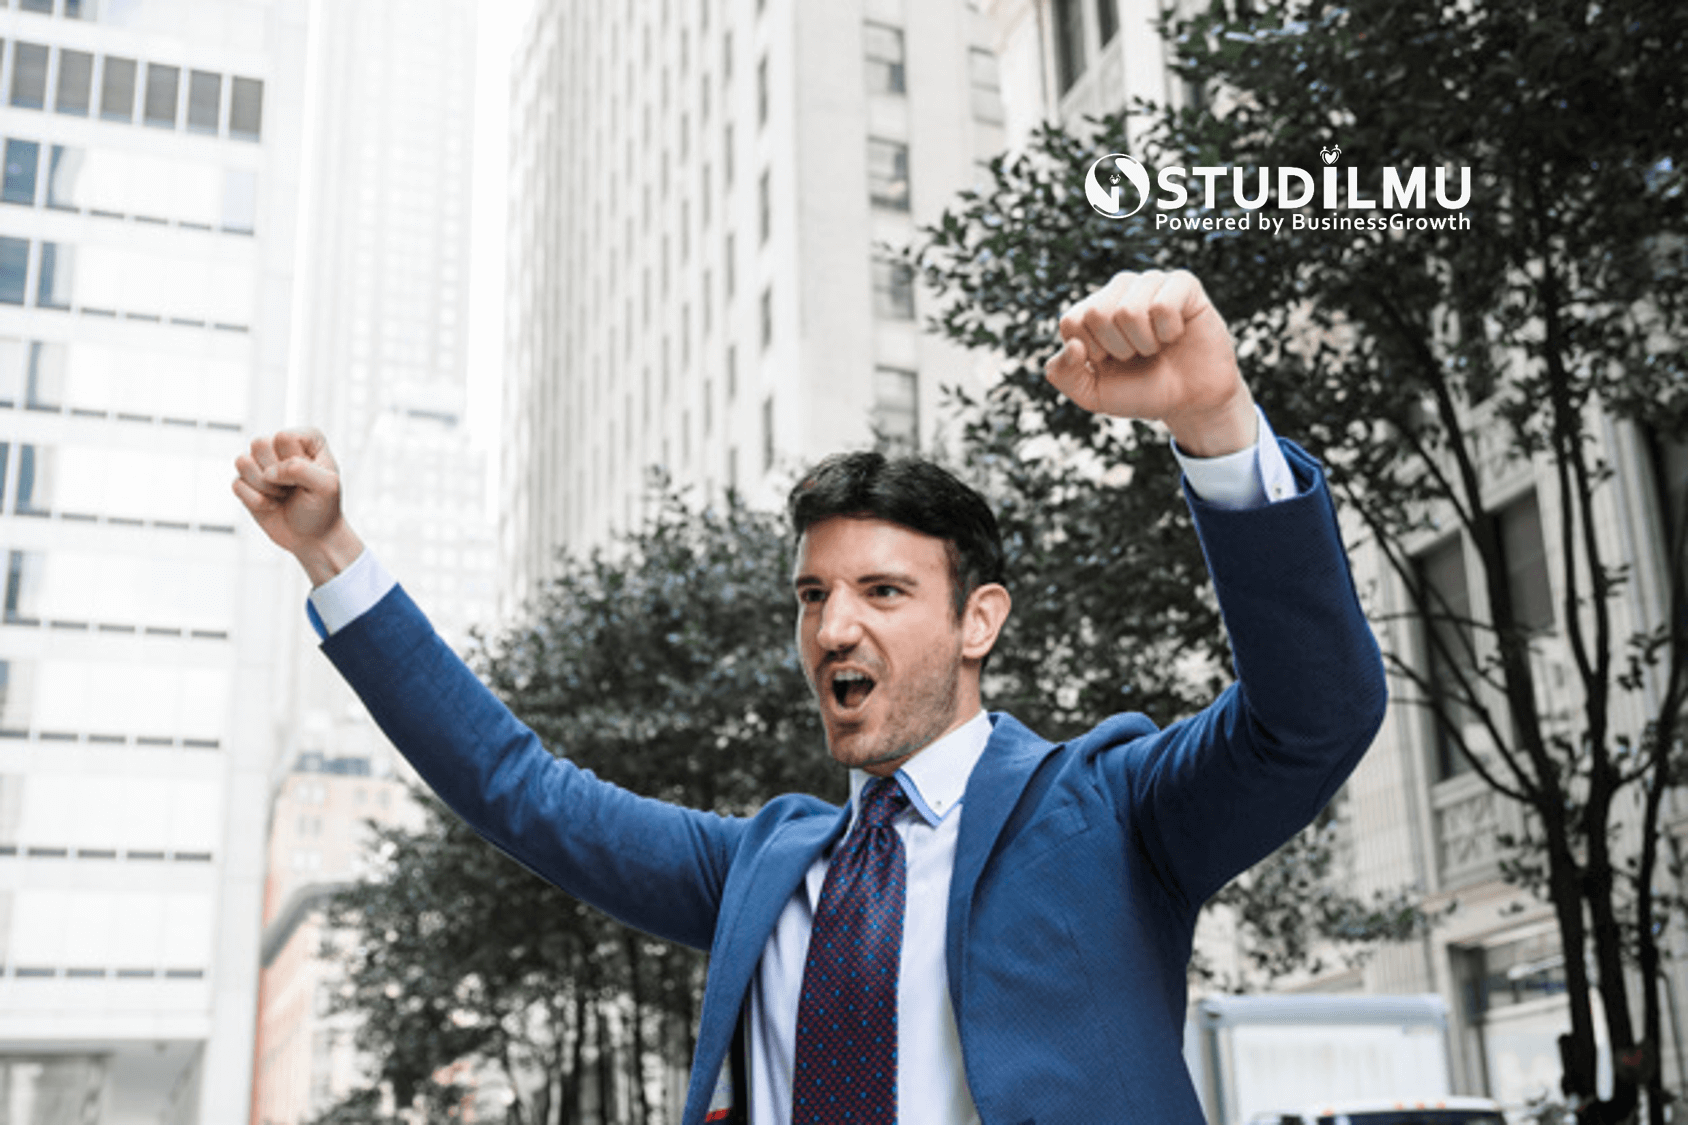 STUDILMU Career Advice - 20 Cara Memberi Semangat Kerja Tim